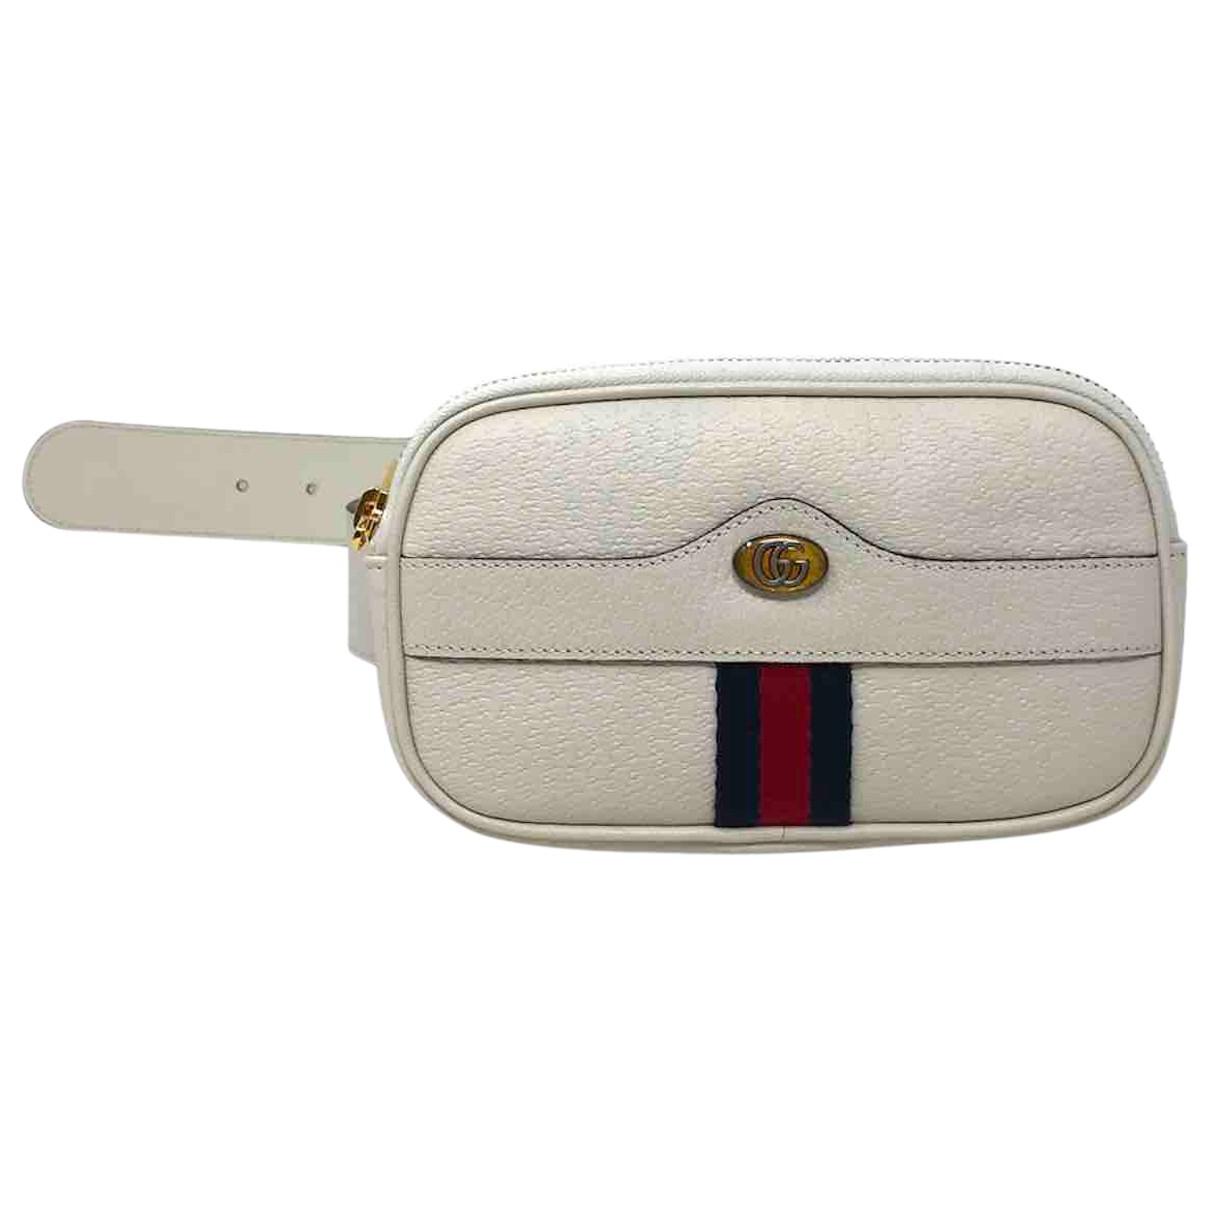 Gucci N White Leather Clutch bag for Women N